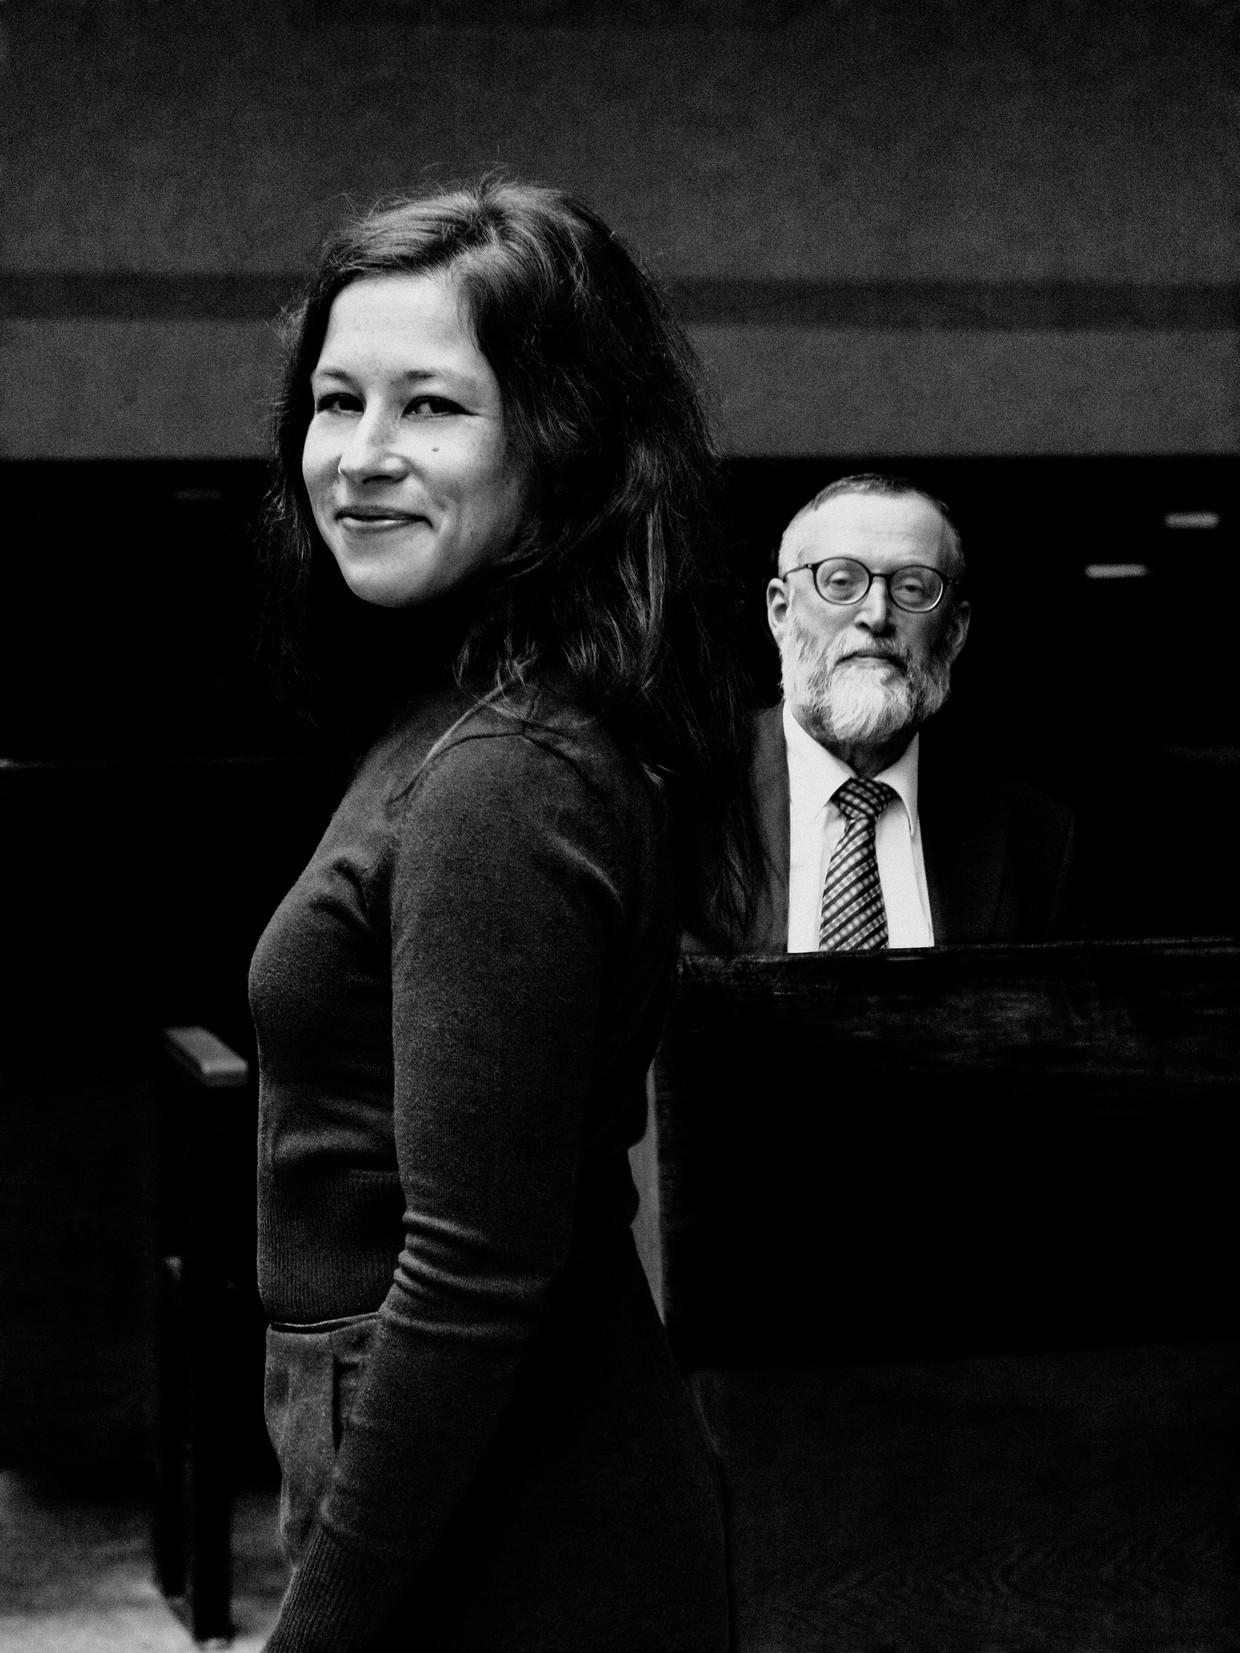 Presentatrice Esther Porcelijn en rabbijn Shmuel Katz.  Beeld Jitske Schols